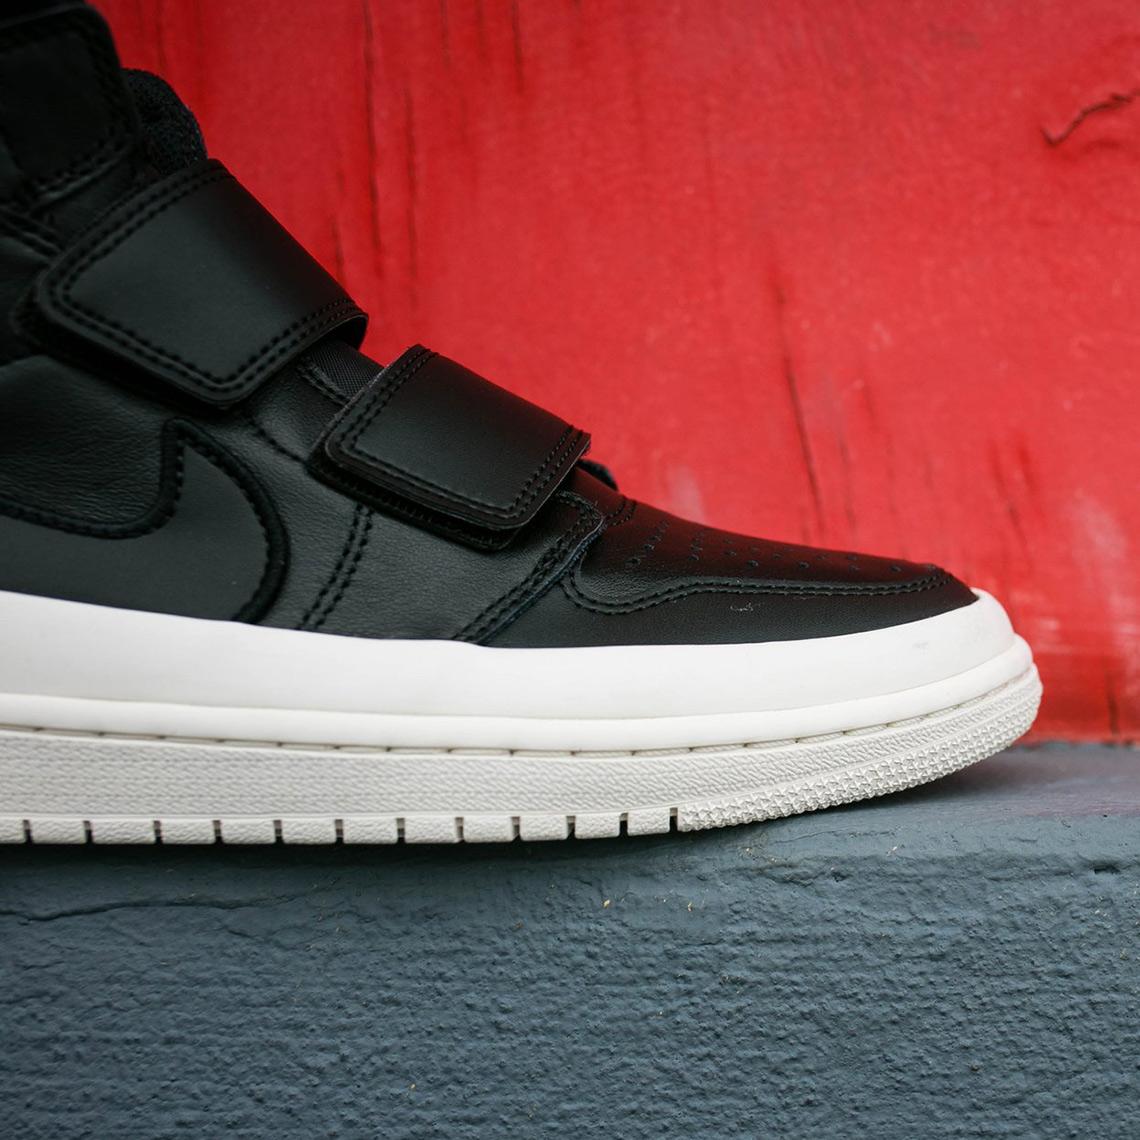 10386f476ea Air Jordan 1 Double Strap AVAILABLE AT Rock City Kicks  140. Color  Black Gym  Red Sail